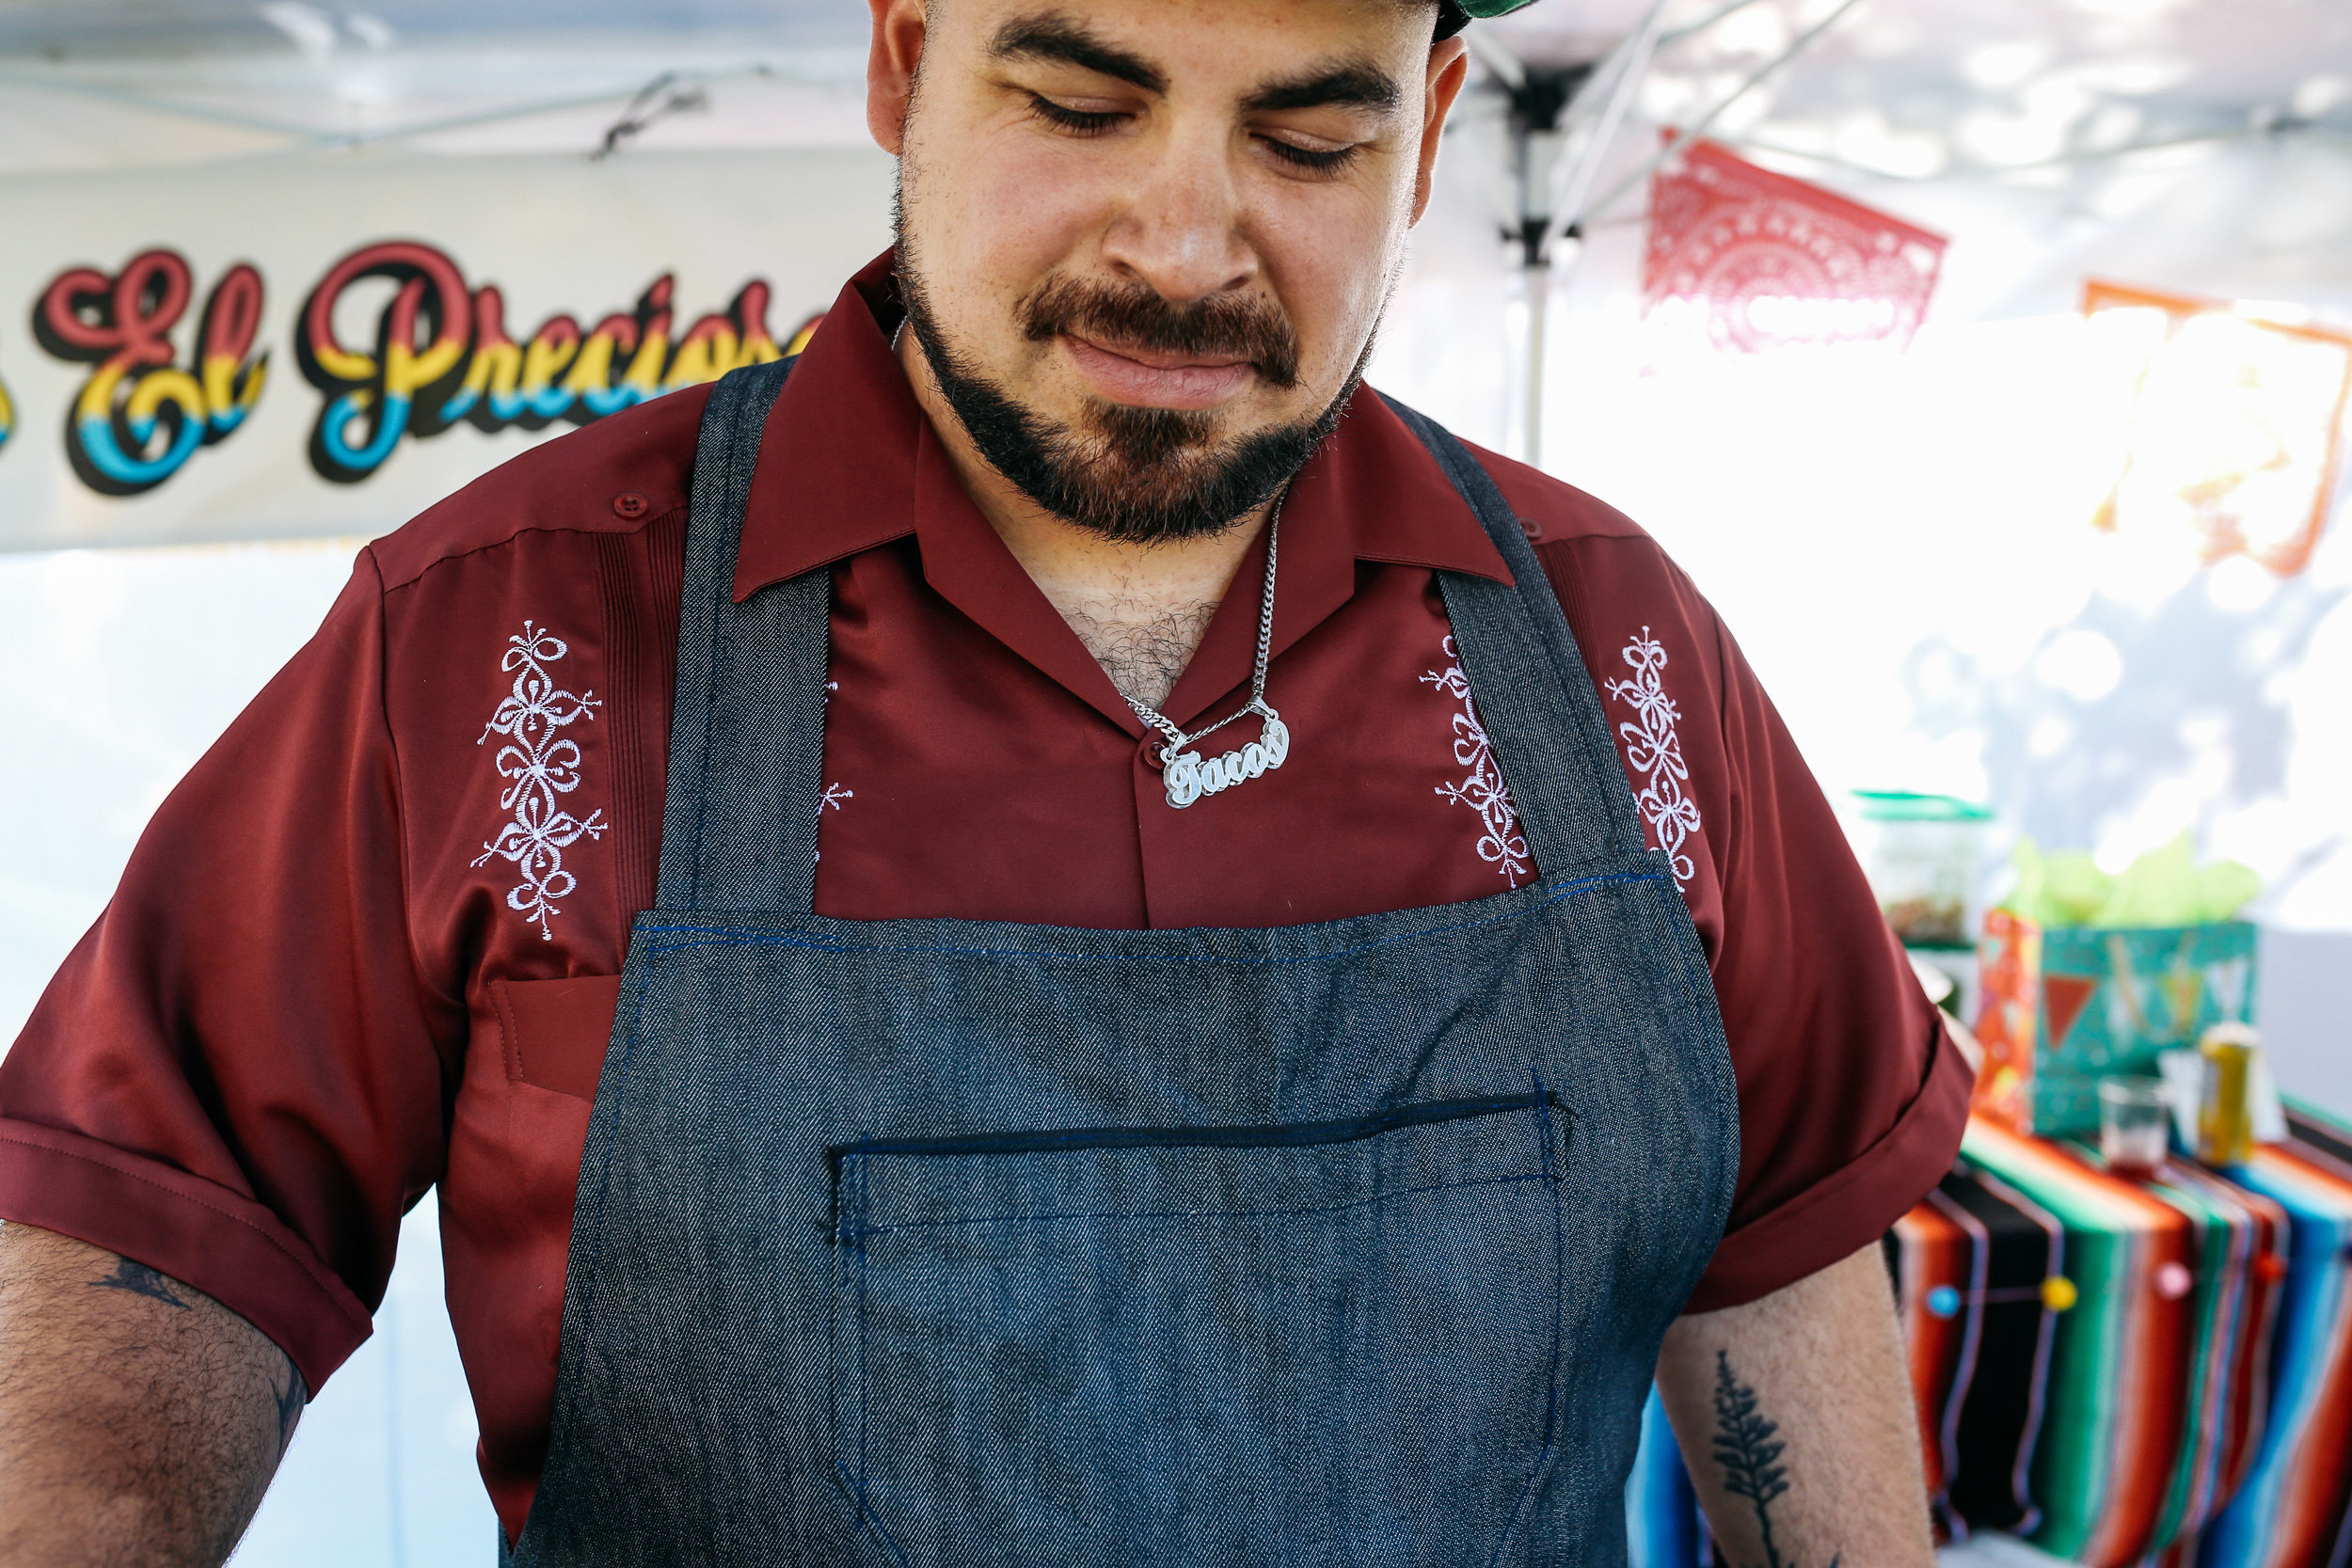 kristenmurakoshi-lifestyle-tacos-el-precioso-17.jpg